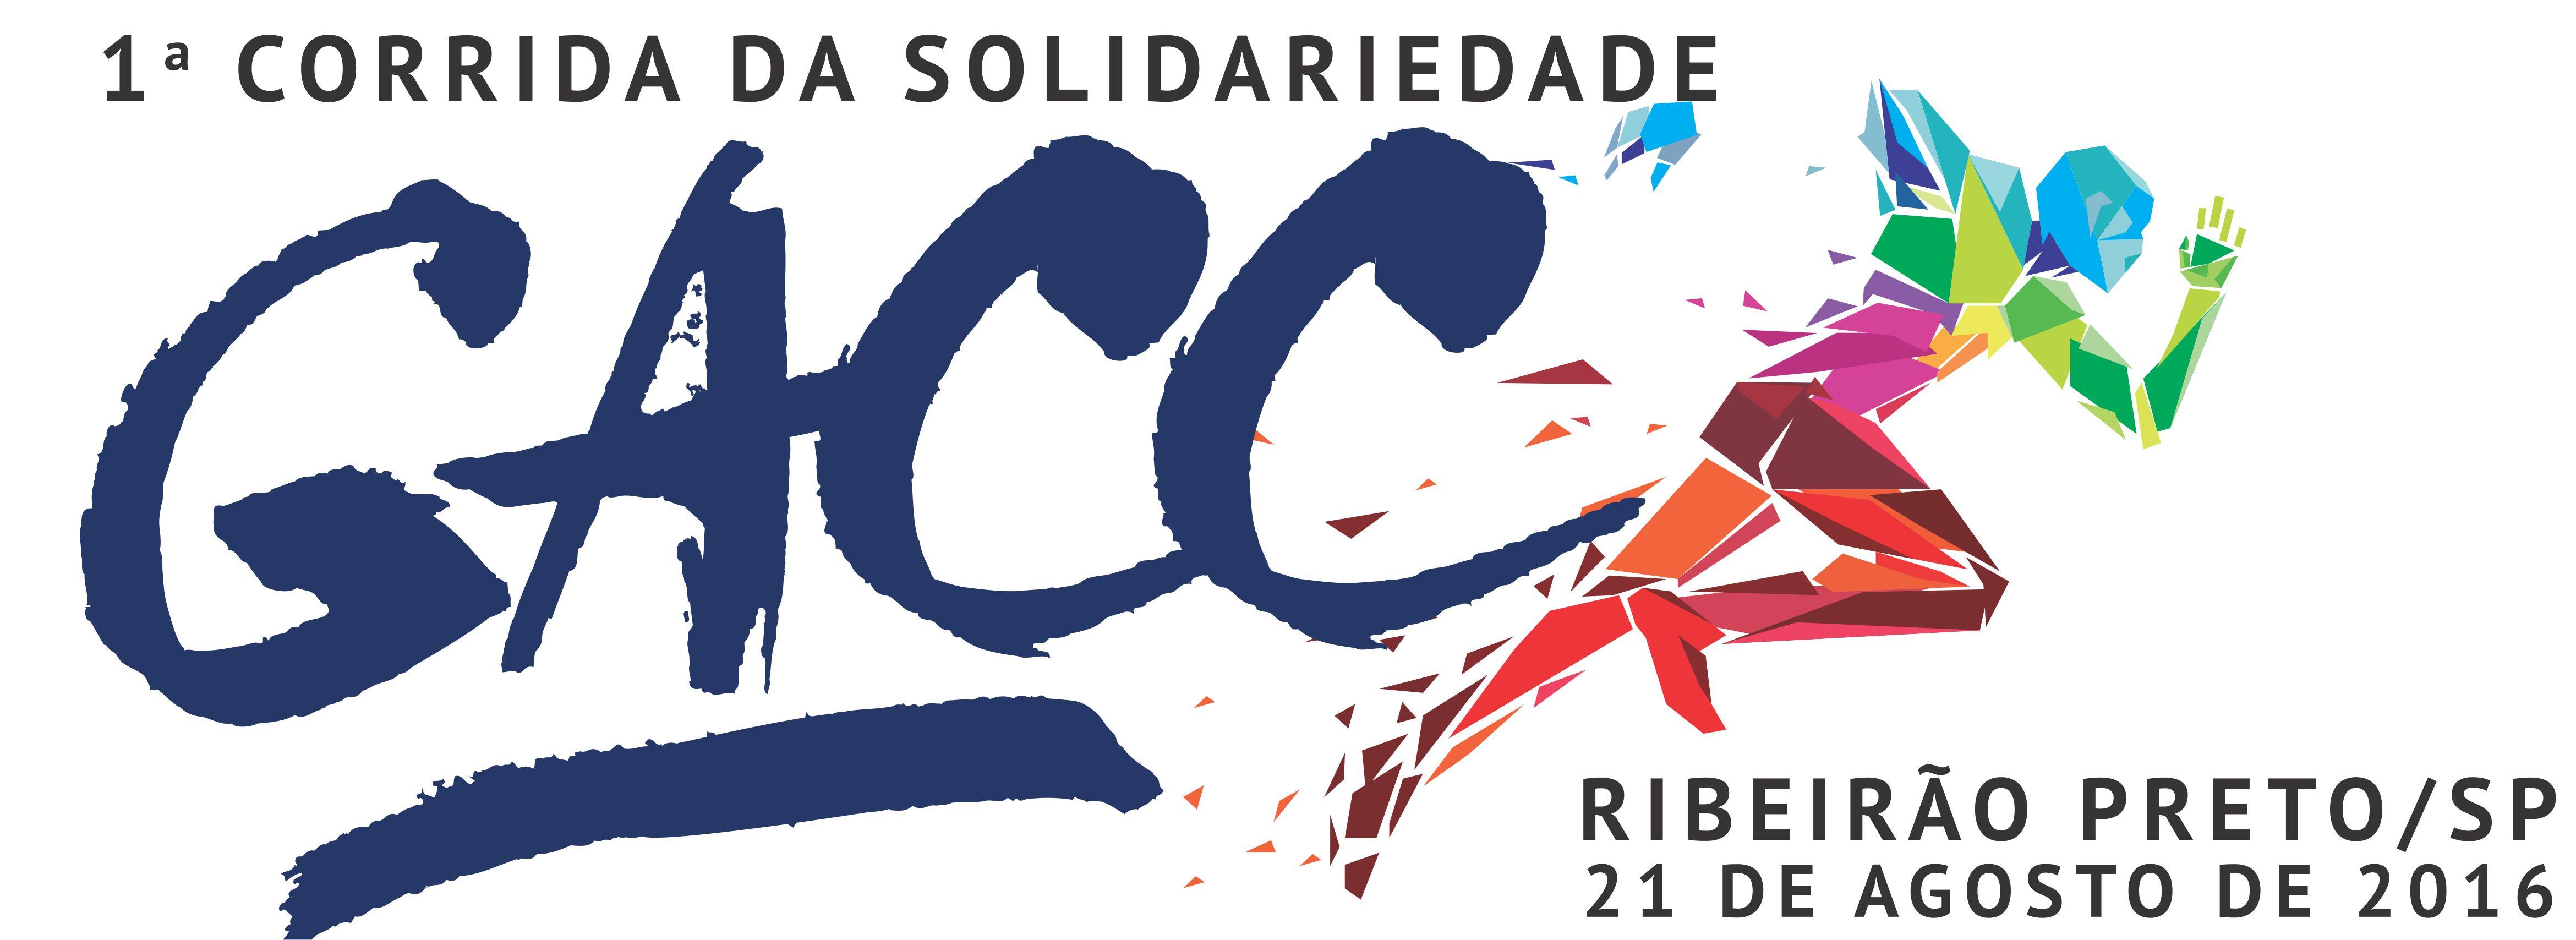 corrida-gacc-ribeirao-preto-2016